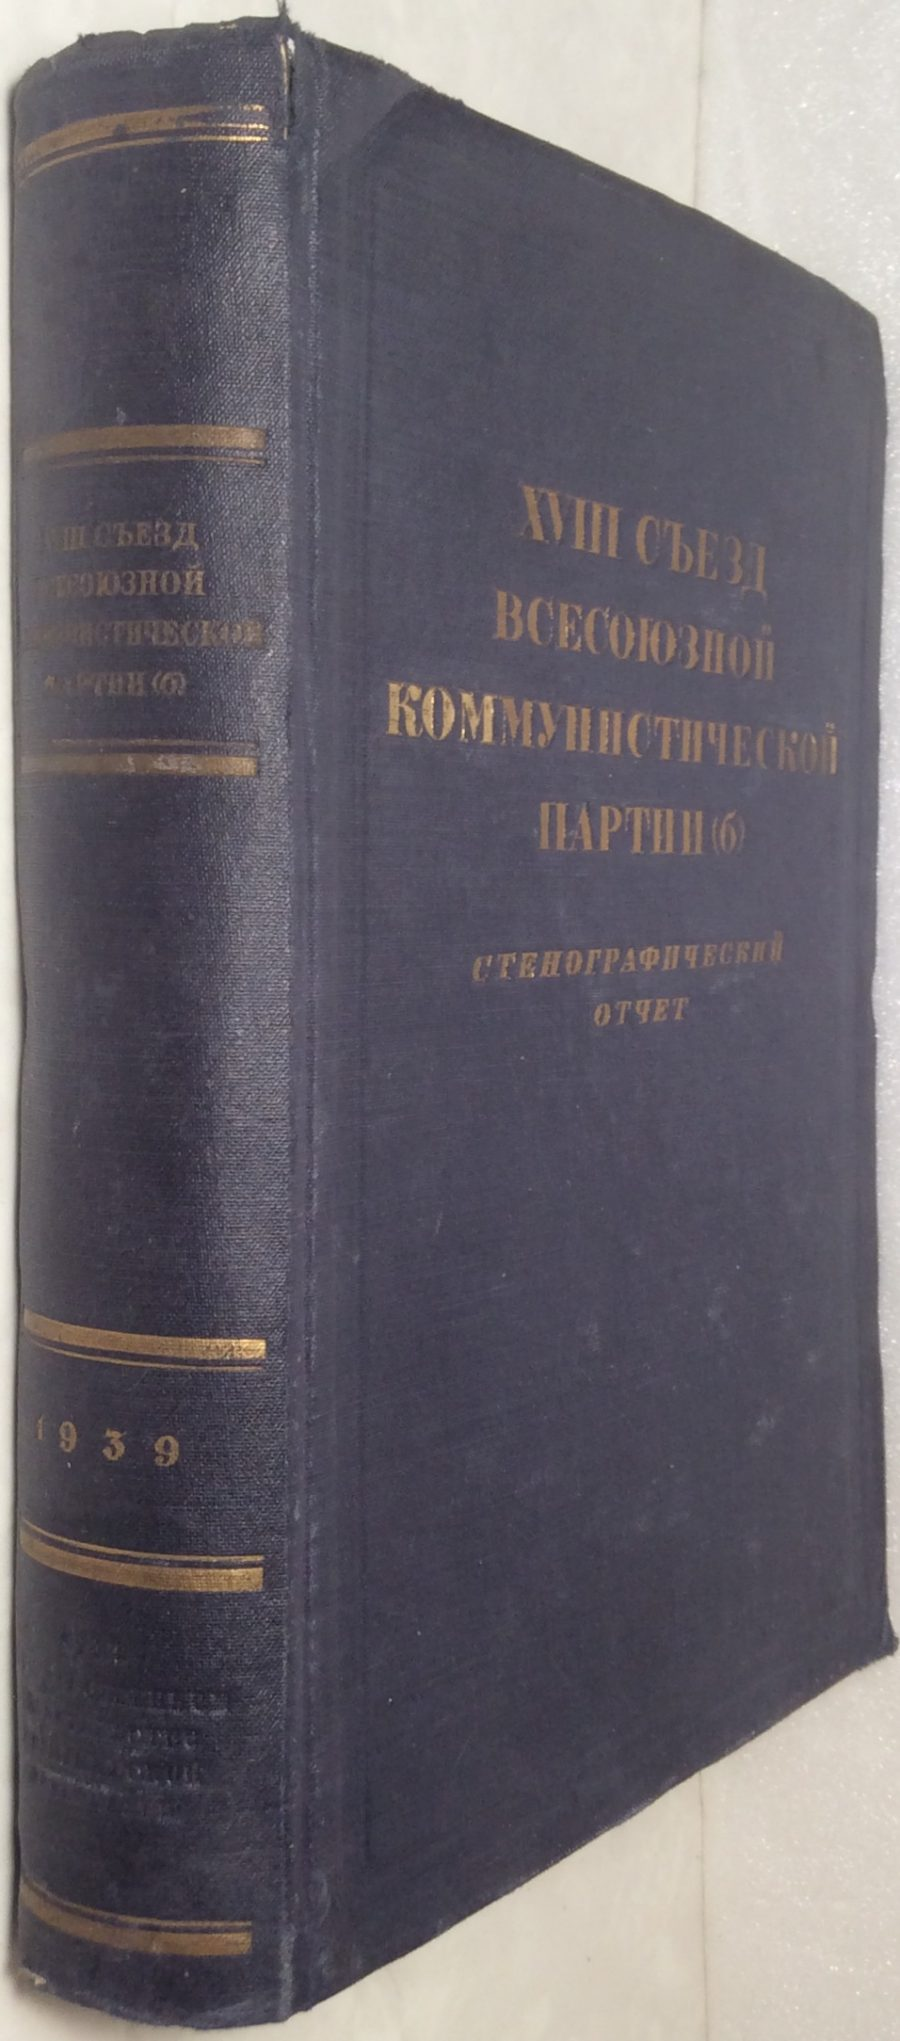 18 съезд ВКП(б)